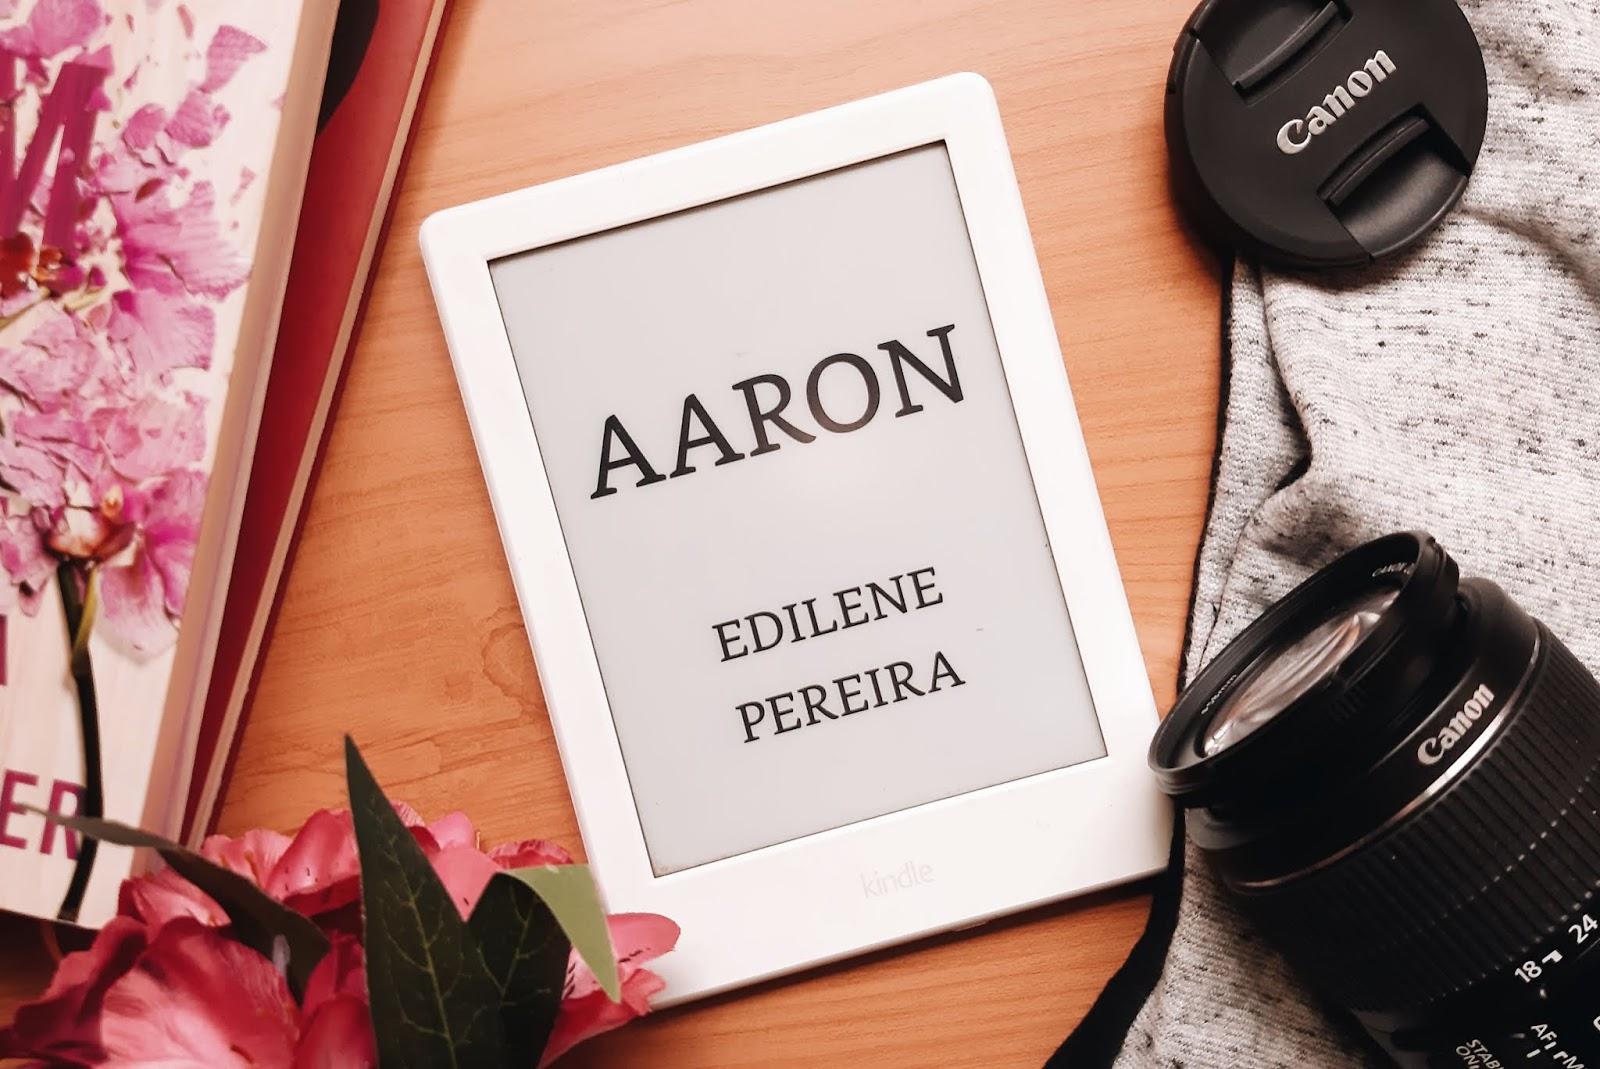 Aaron: Senhor dos meus desejos - Edilene Pereira | Resenha